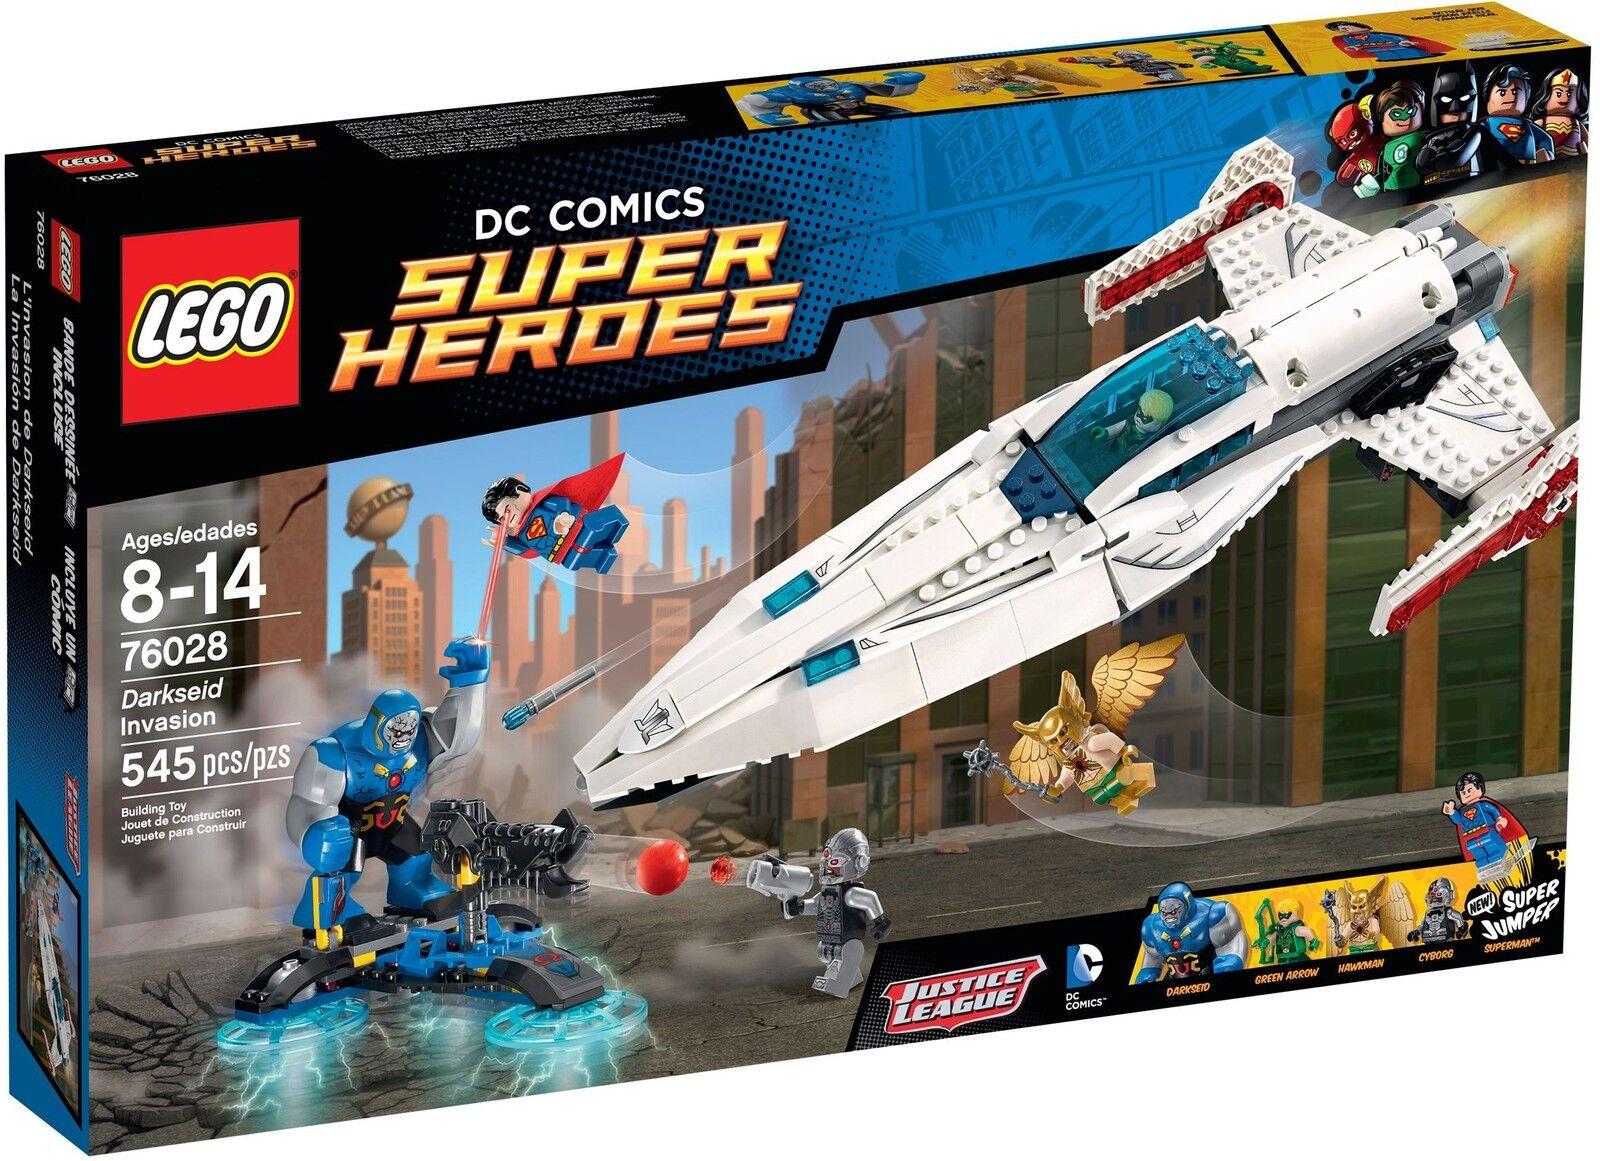 LEGO DC super Heroes - 76028 Darkseid invasion M. superman & manquante-NEUF & OVP